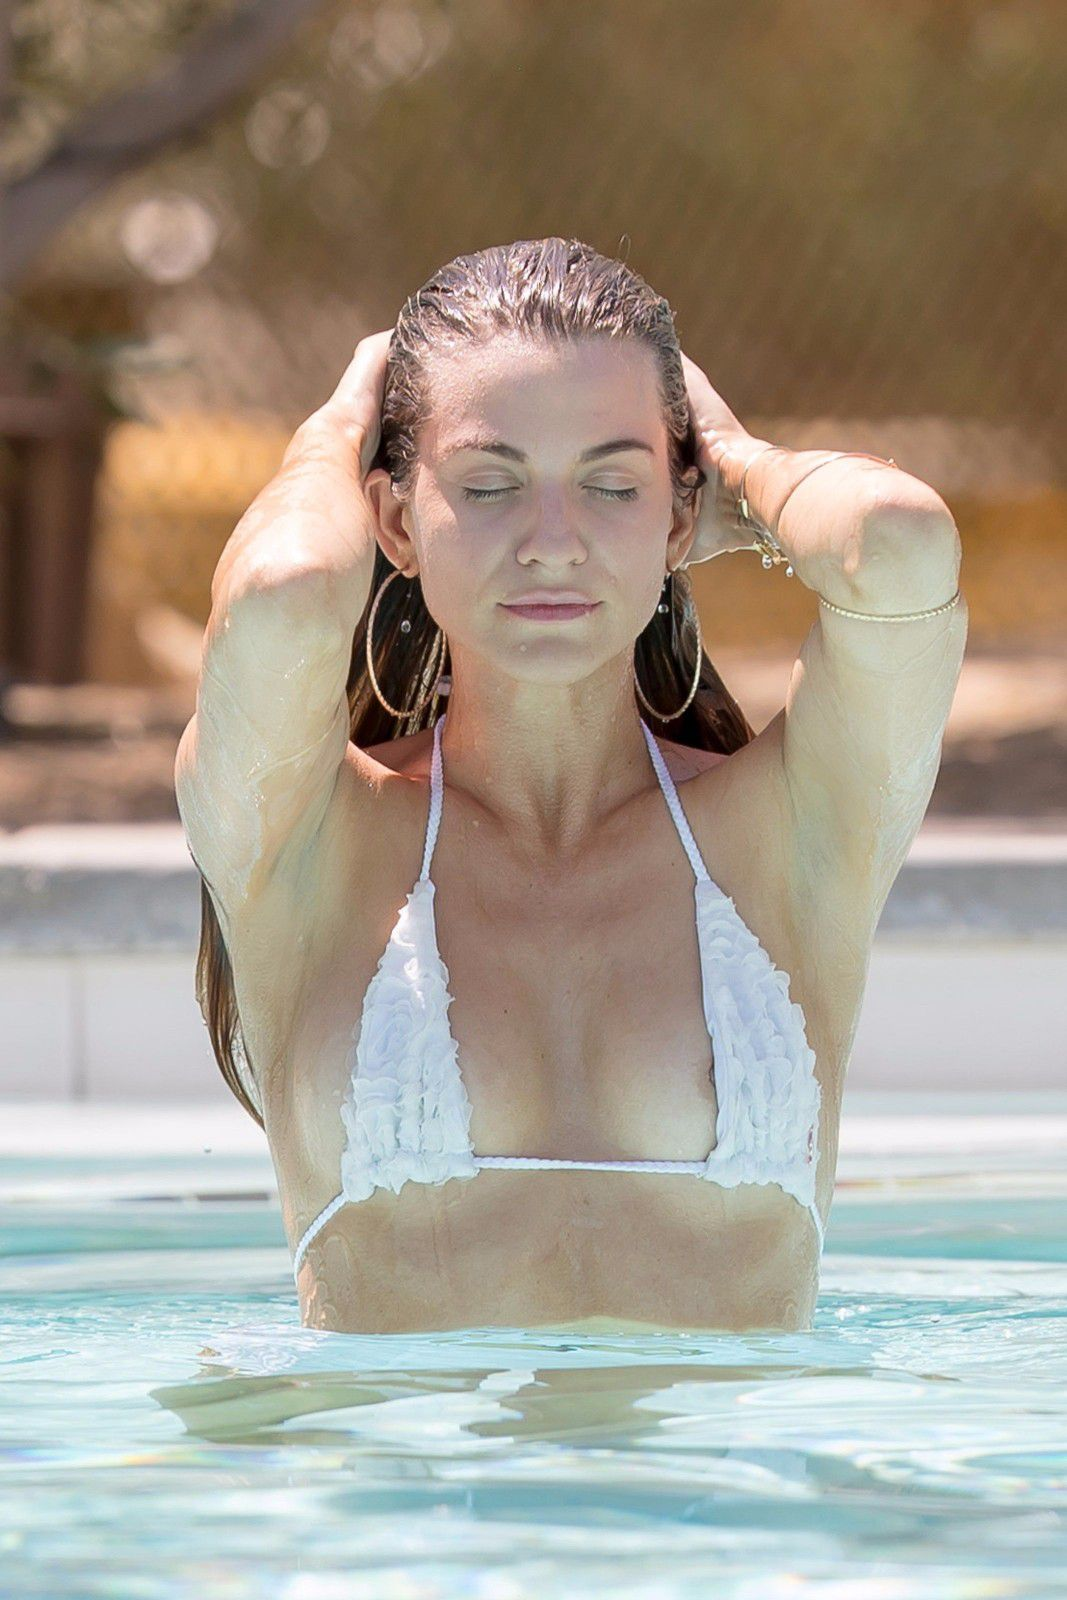 pool-girl-nipple-slip